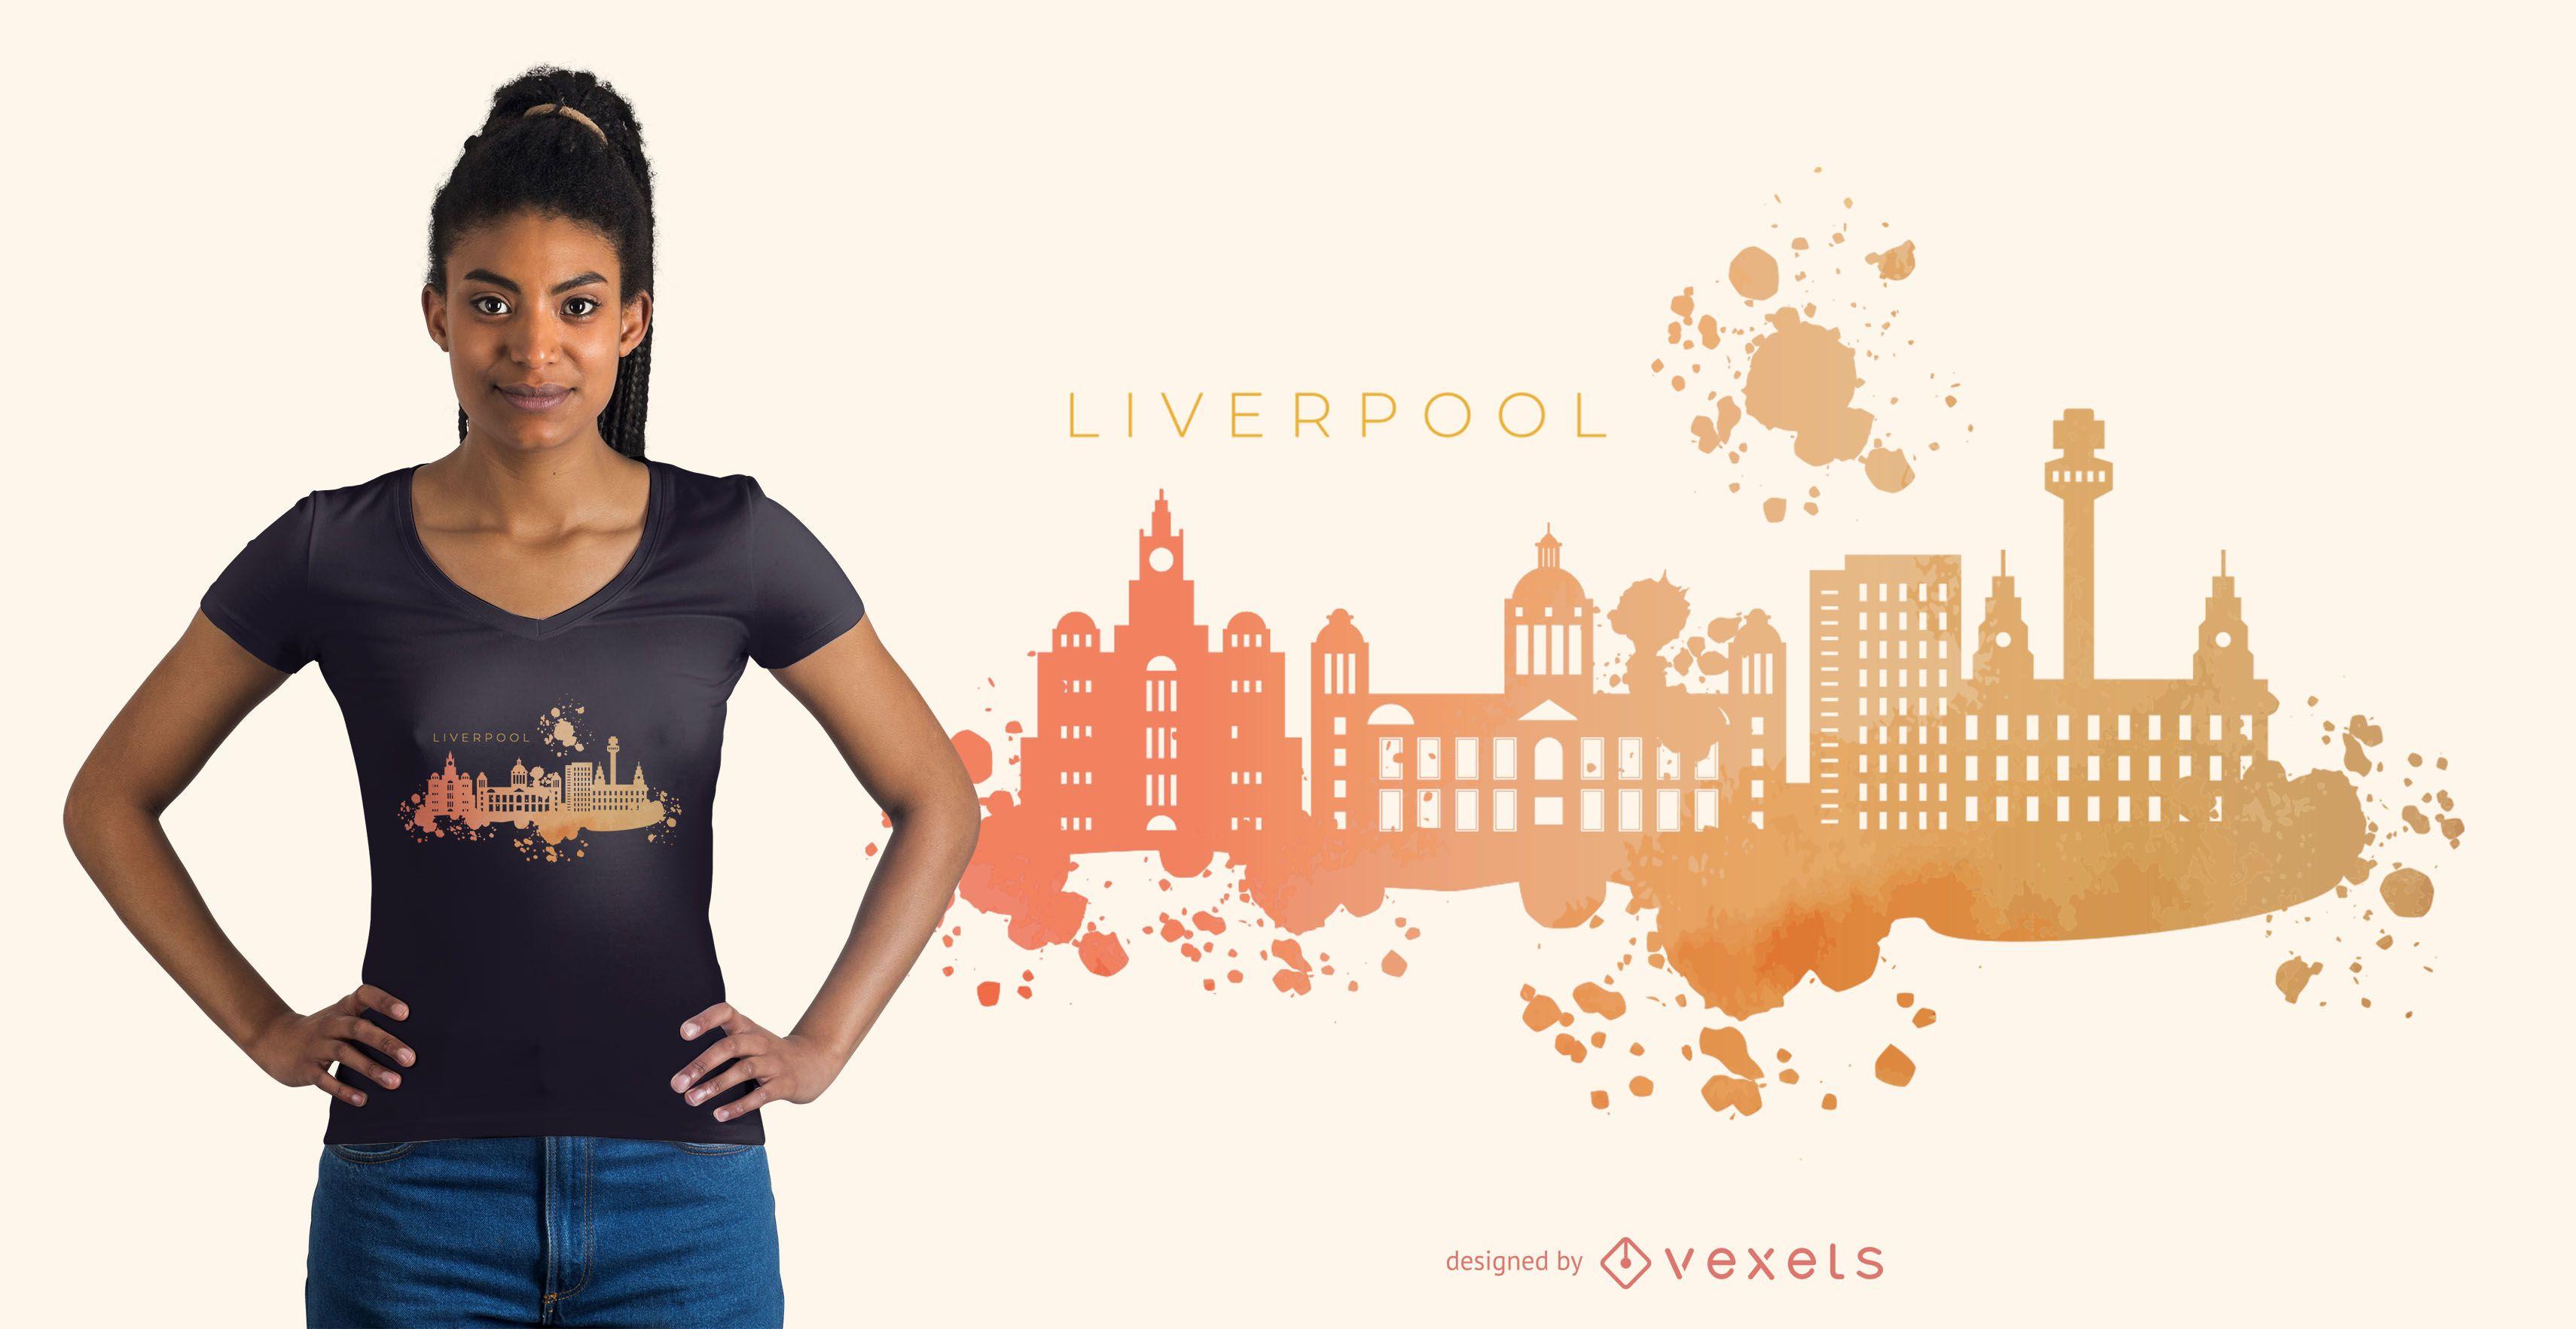 Liverpool watercolor skyline t-shirt design